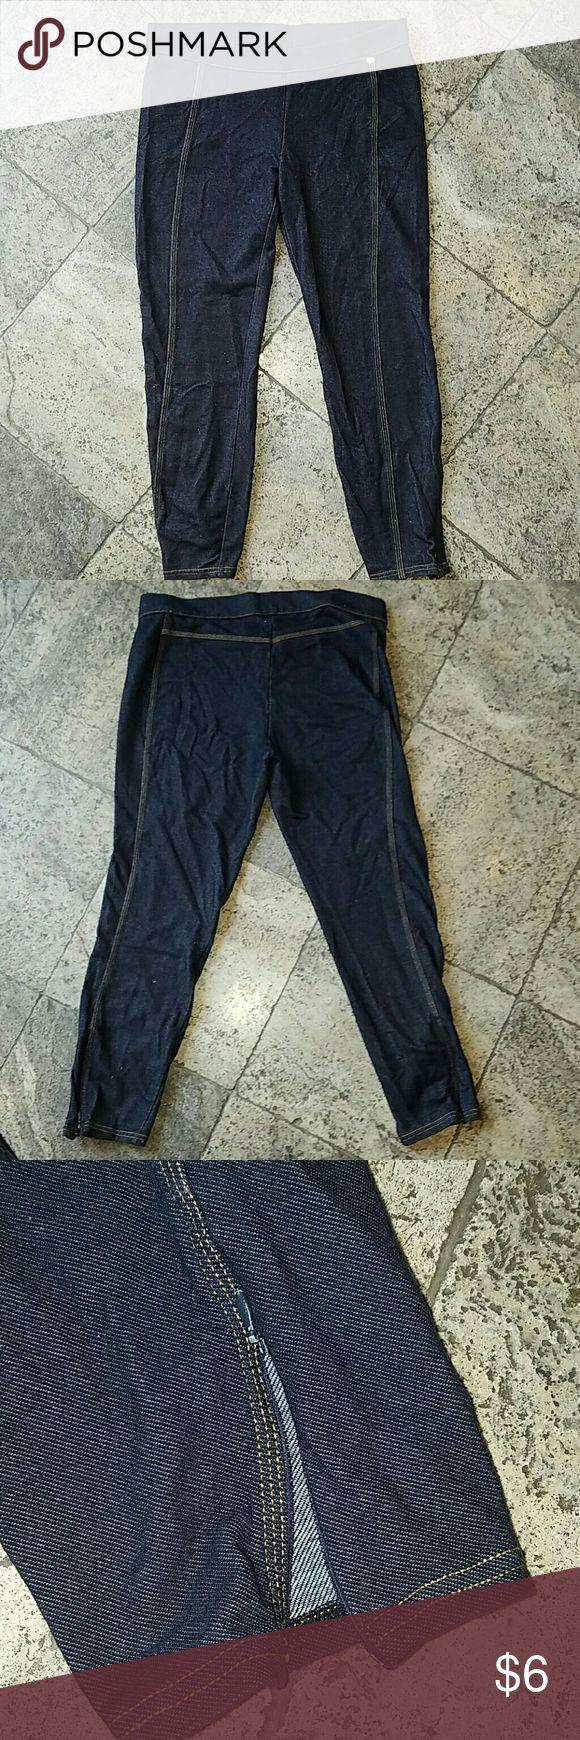 Armani Exchange denim-like capri leggings Armani Exchange denim-like capri leggings, soft and stretchy, bottom seams have zipper to create small slit, well worn Armani Exchange Pants Capris